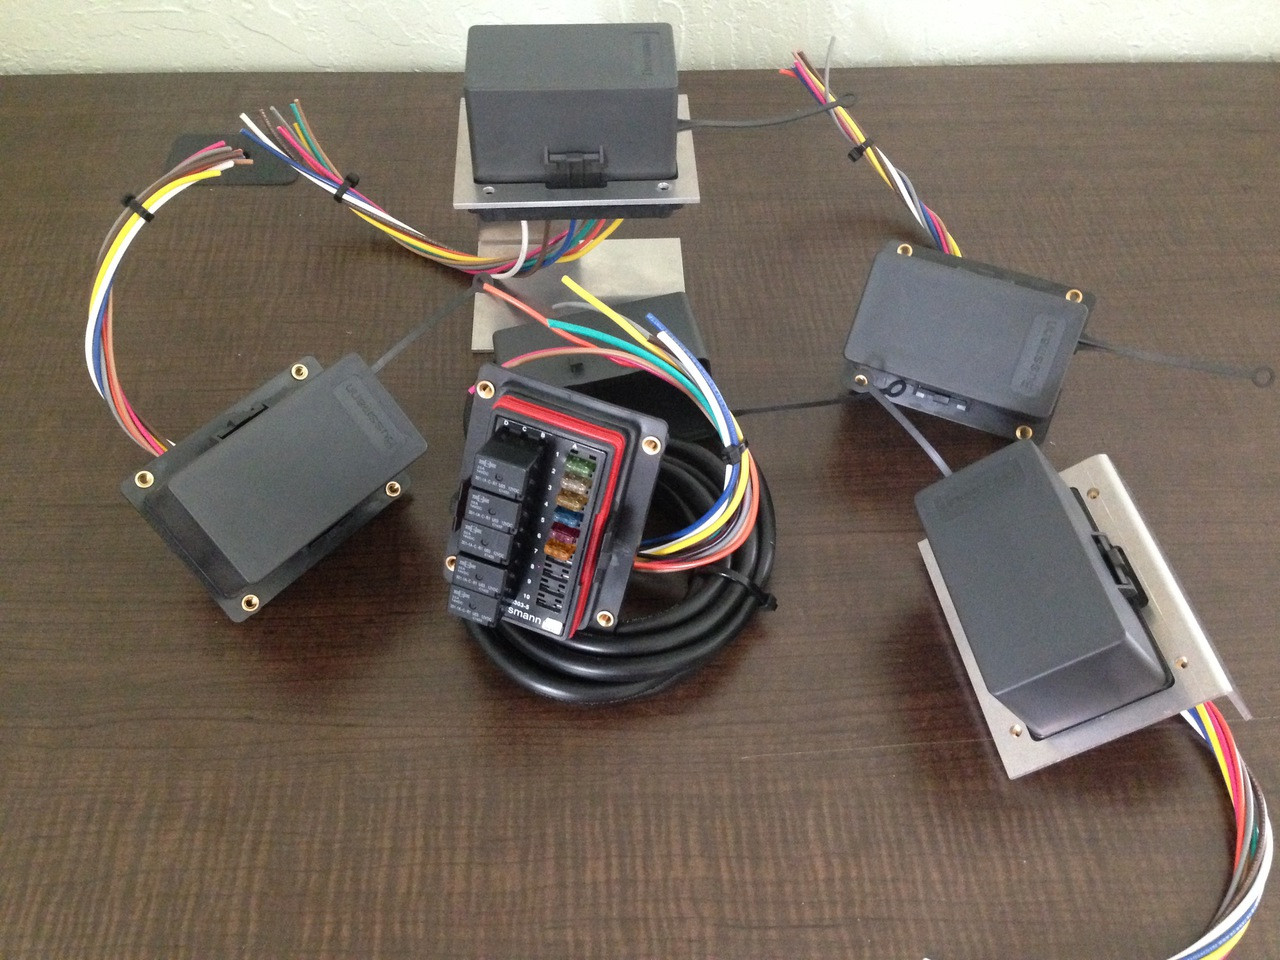 IMG_1740__21059.1438574200.1280.1280?c=2 bussmann rtmr fuse relay box prewired 4 ft lead tacoma pros